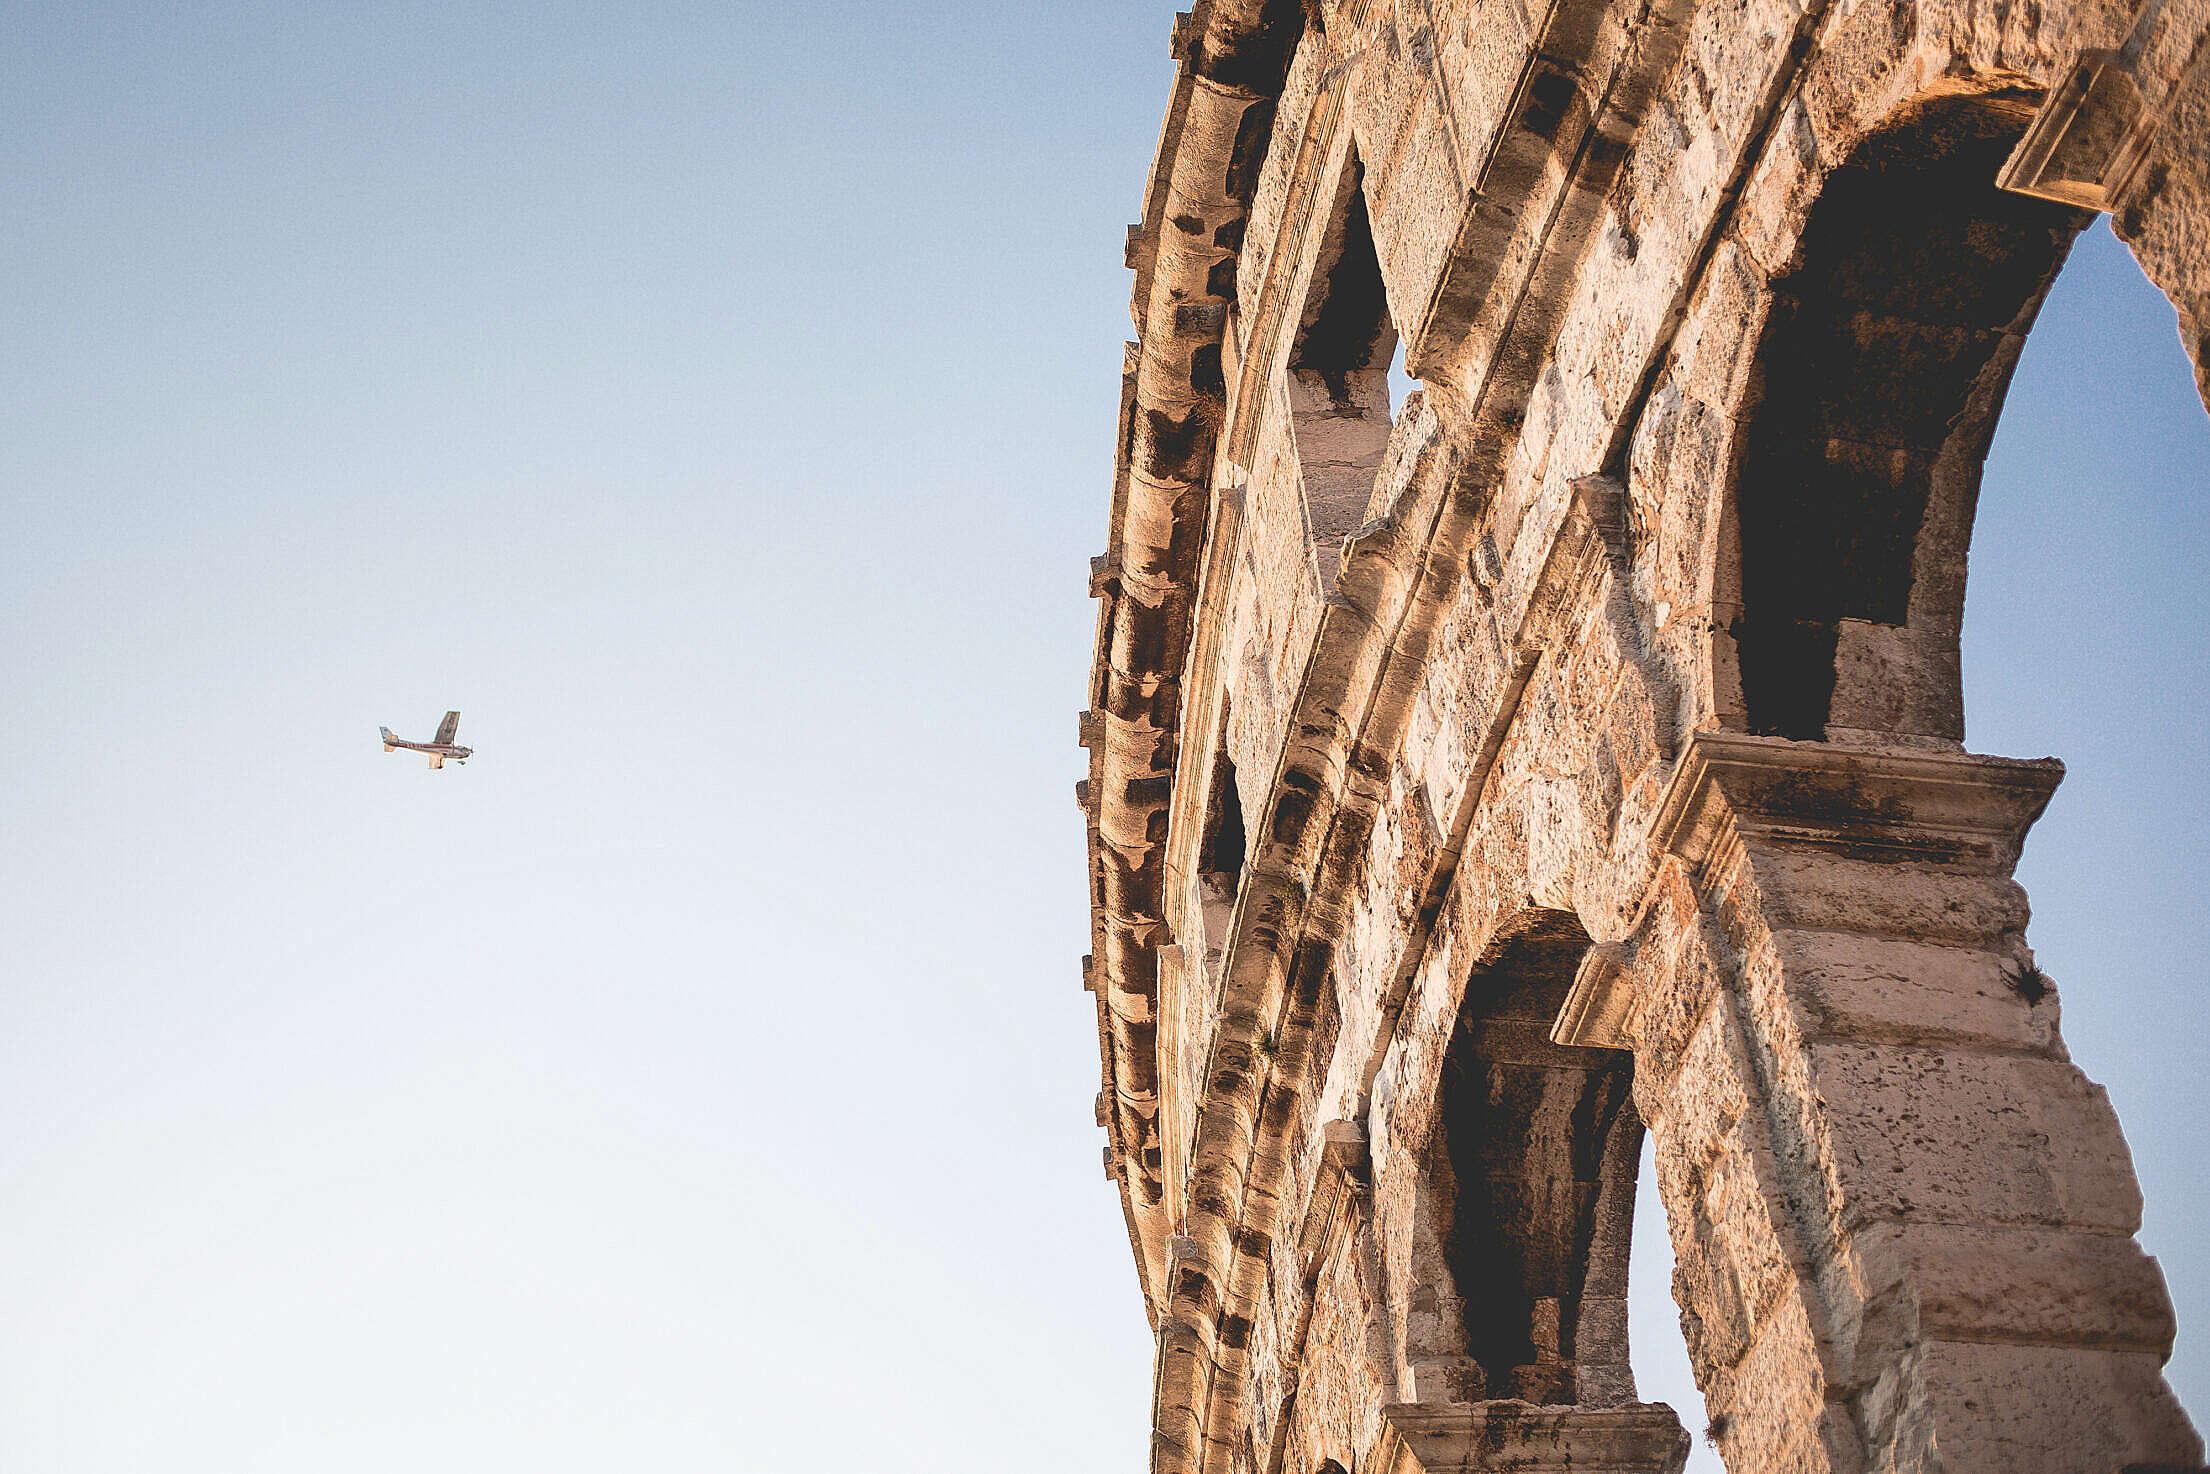 Little Plane and Roman Arena in Pula, Croatia Free Stock Photo